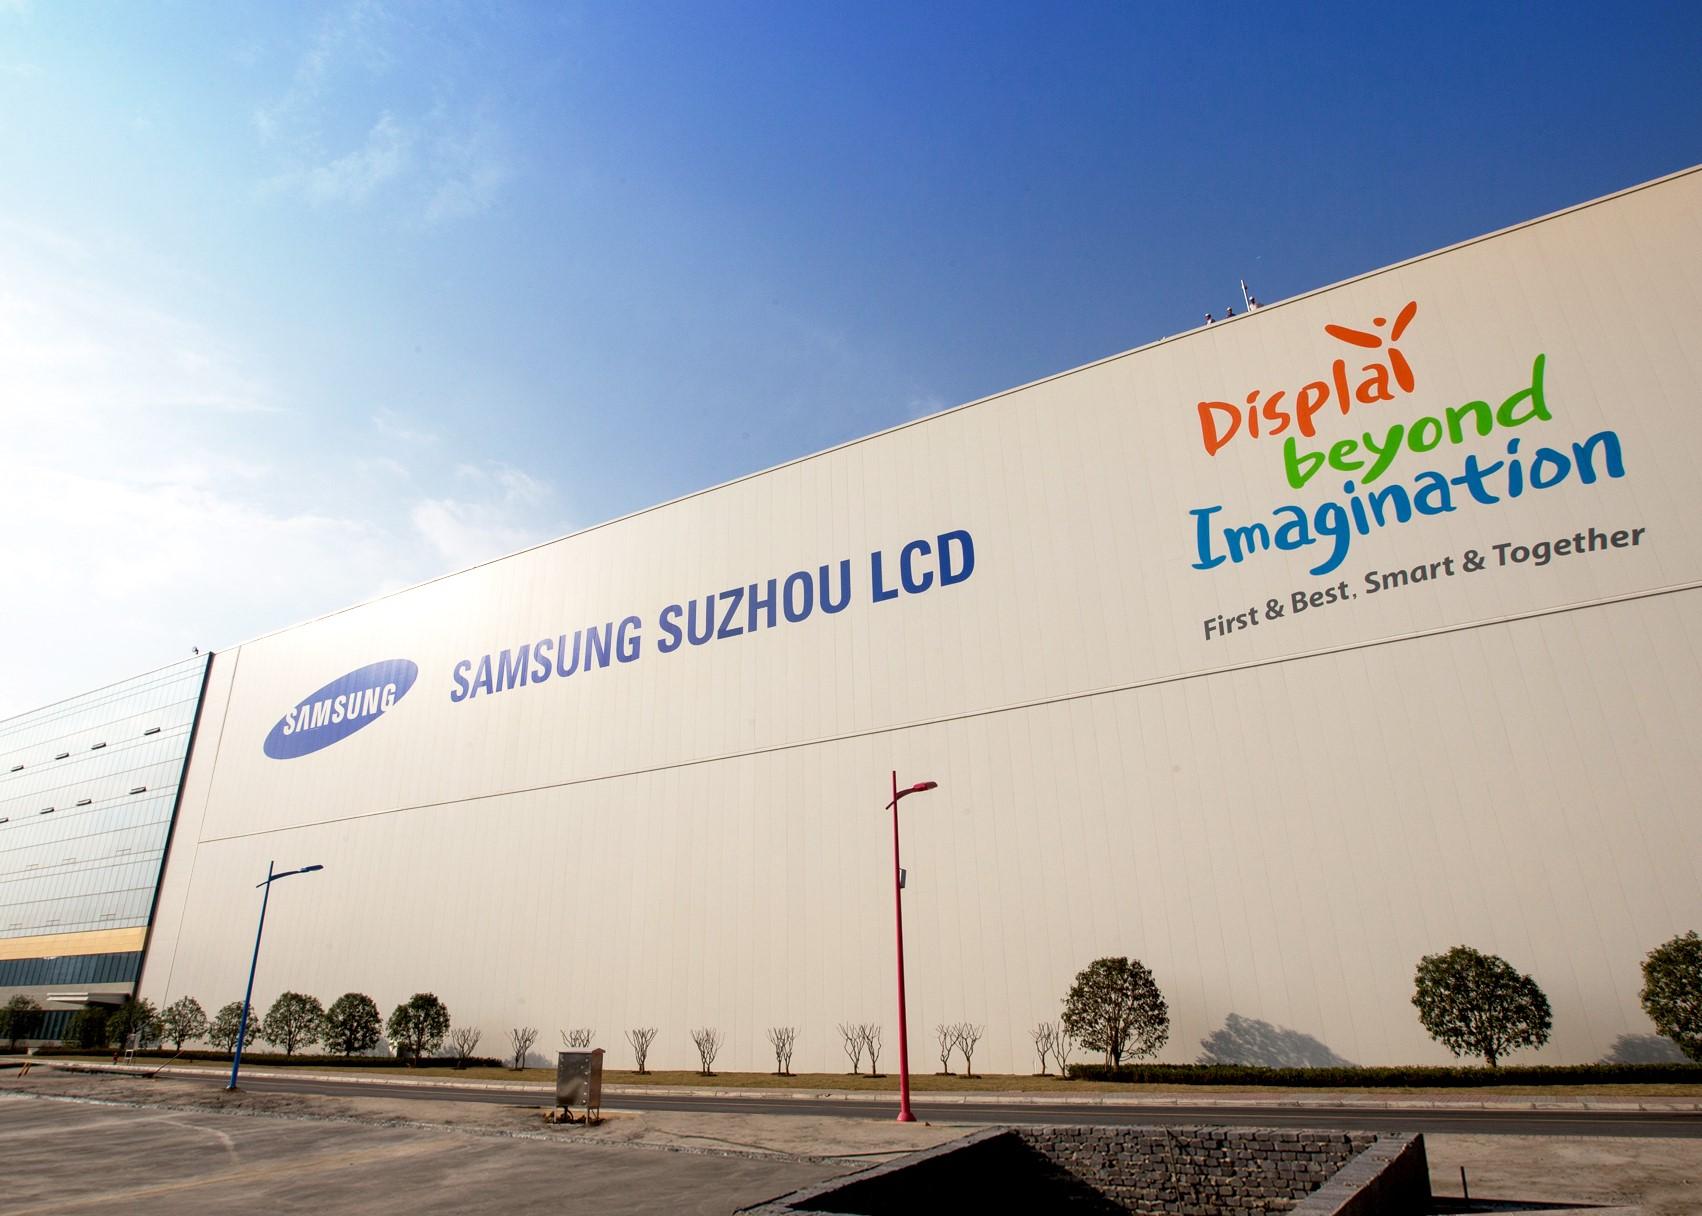 Samsung Display in China